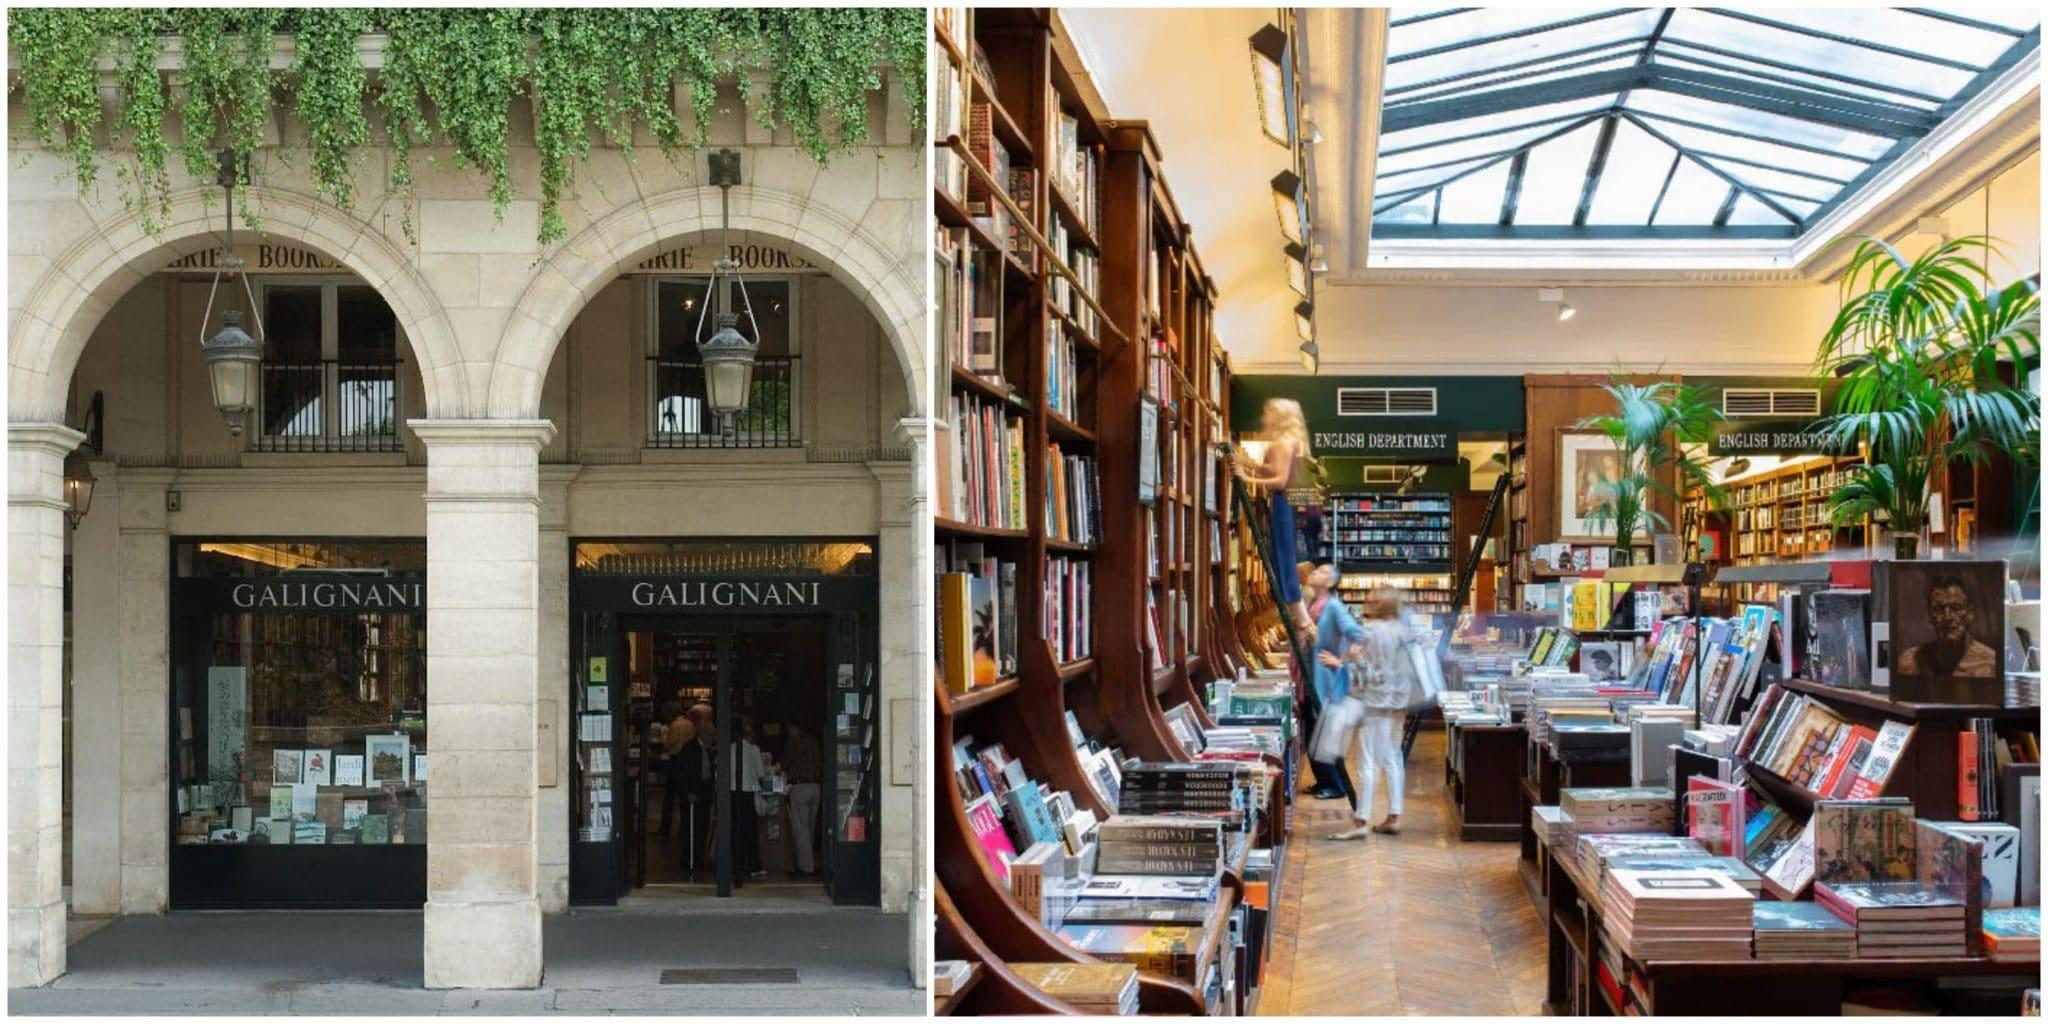 galignani bookstore paris librairie anglaise anglophone anglosaxonne